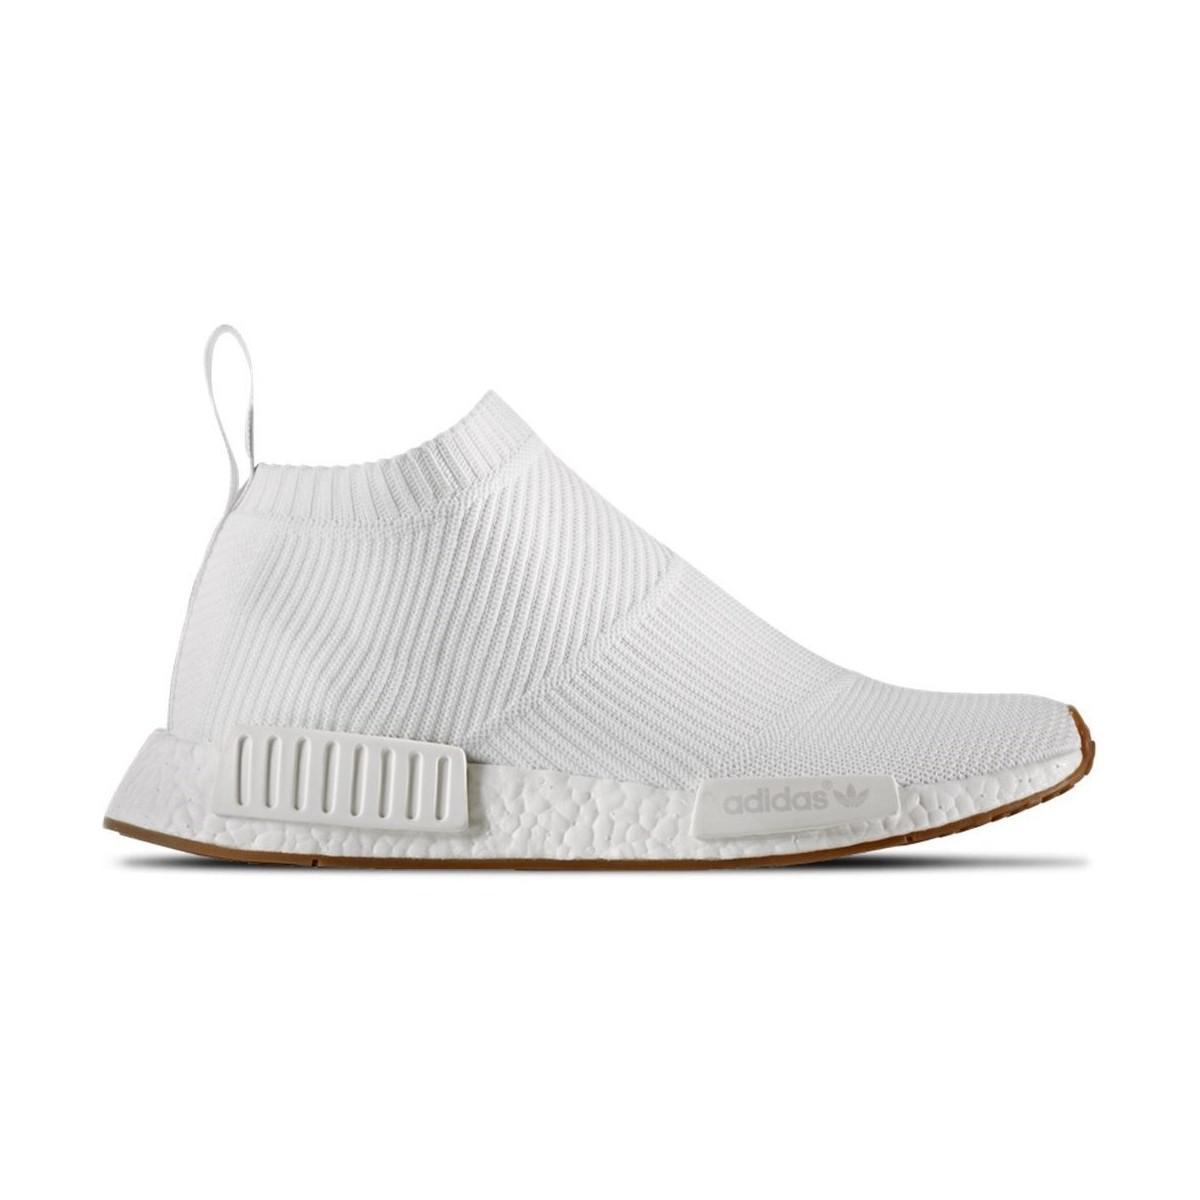 lyst adidas nmd cs1 pk scarpe da uomo (high top formatori) in bianco